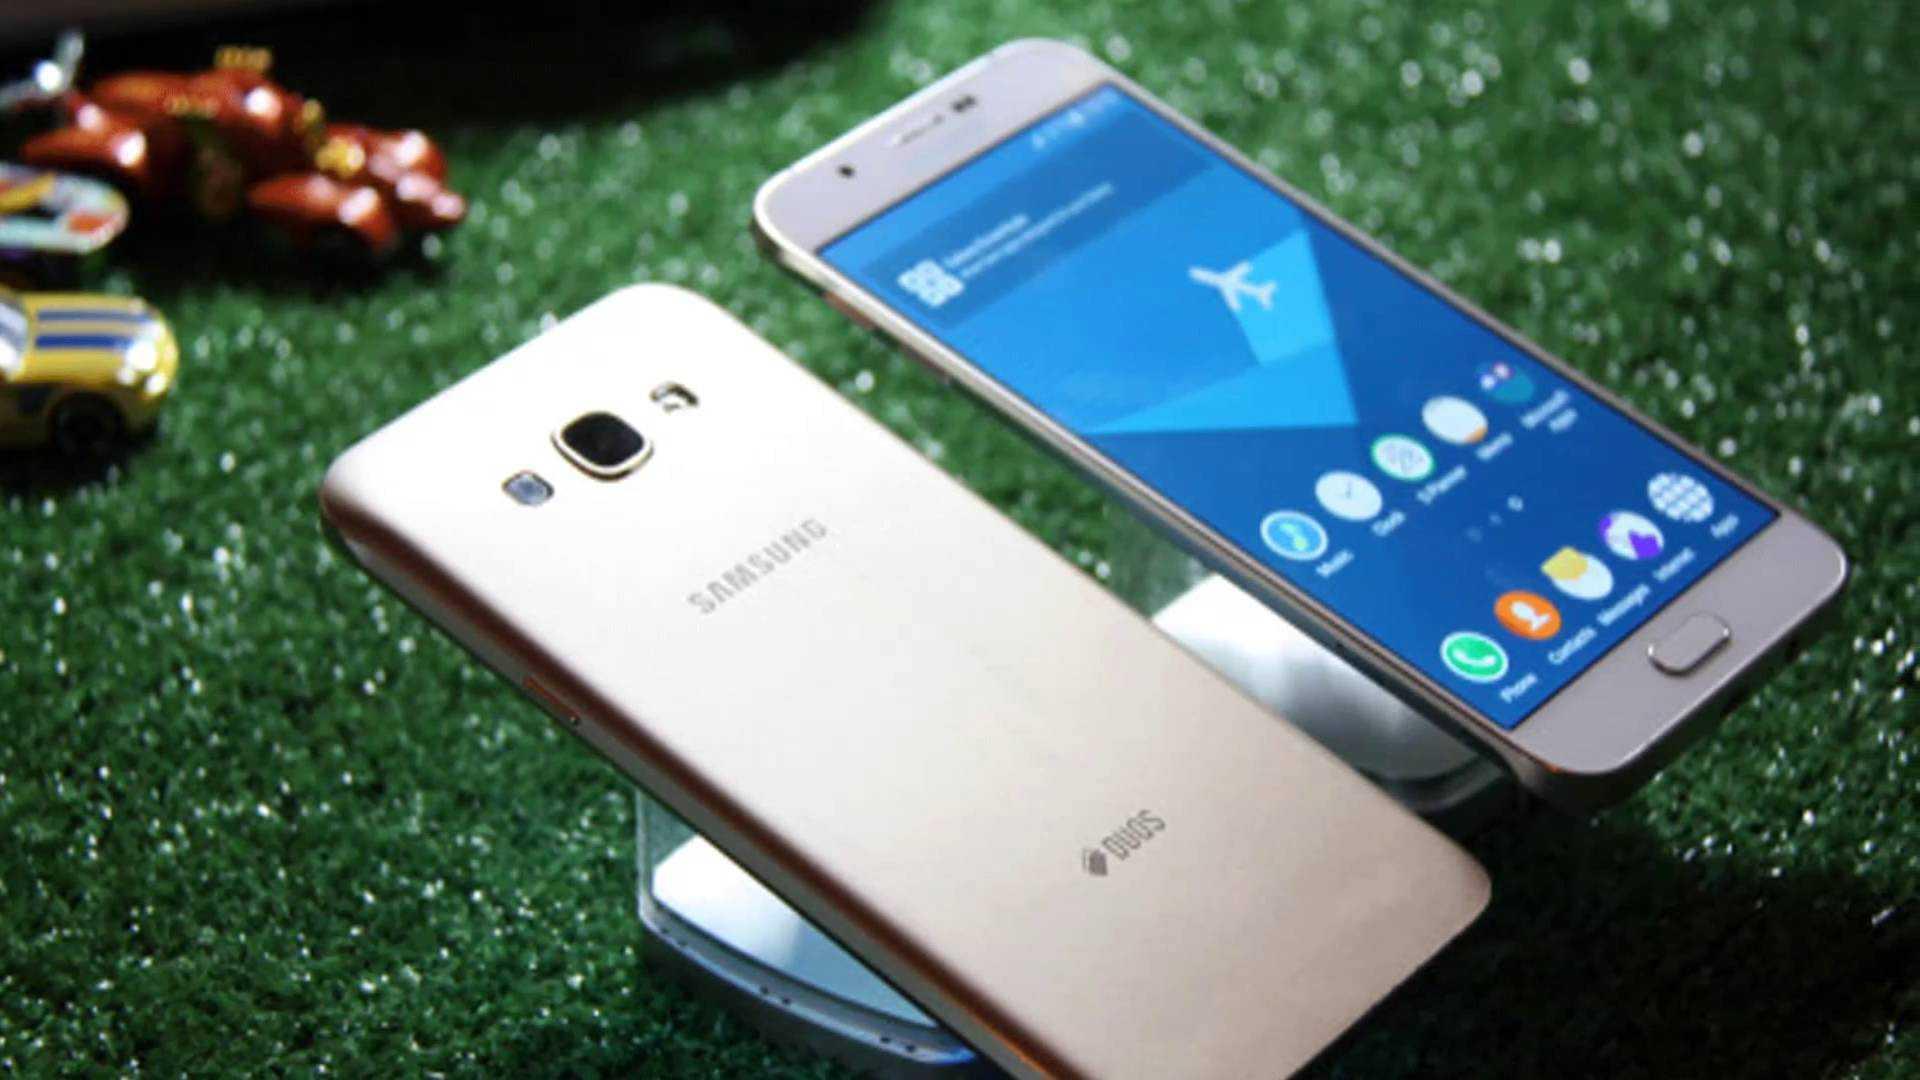 Samsung galaxy a8 2016 pictures official photos - Samsung Galaxy A8 2016 Pictures Official Photos 7